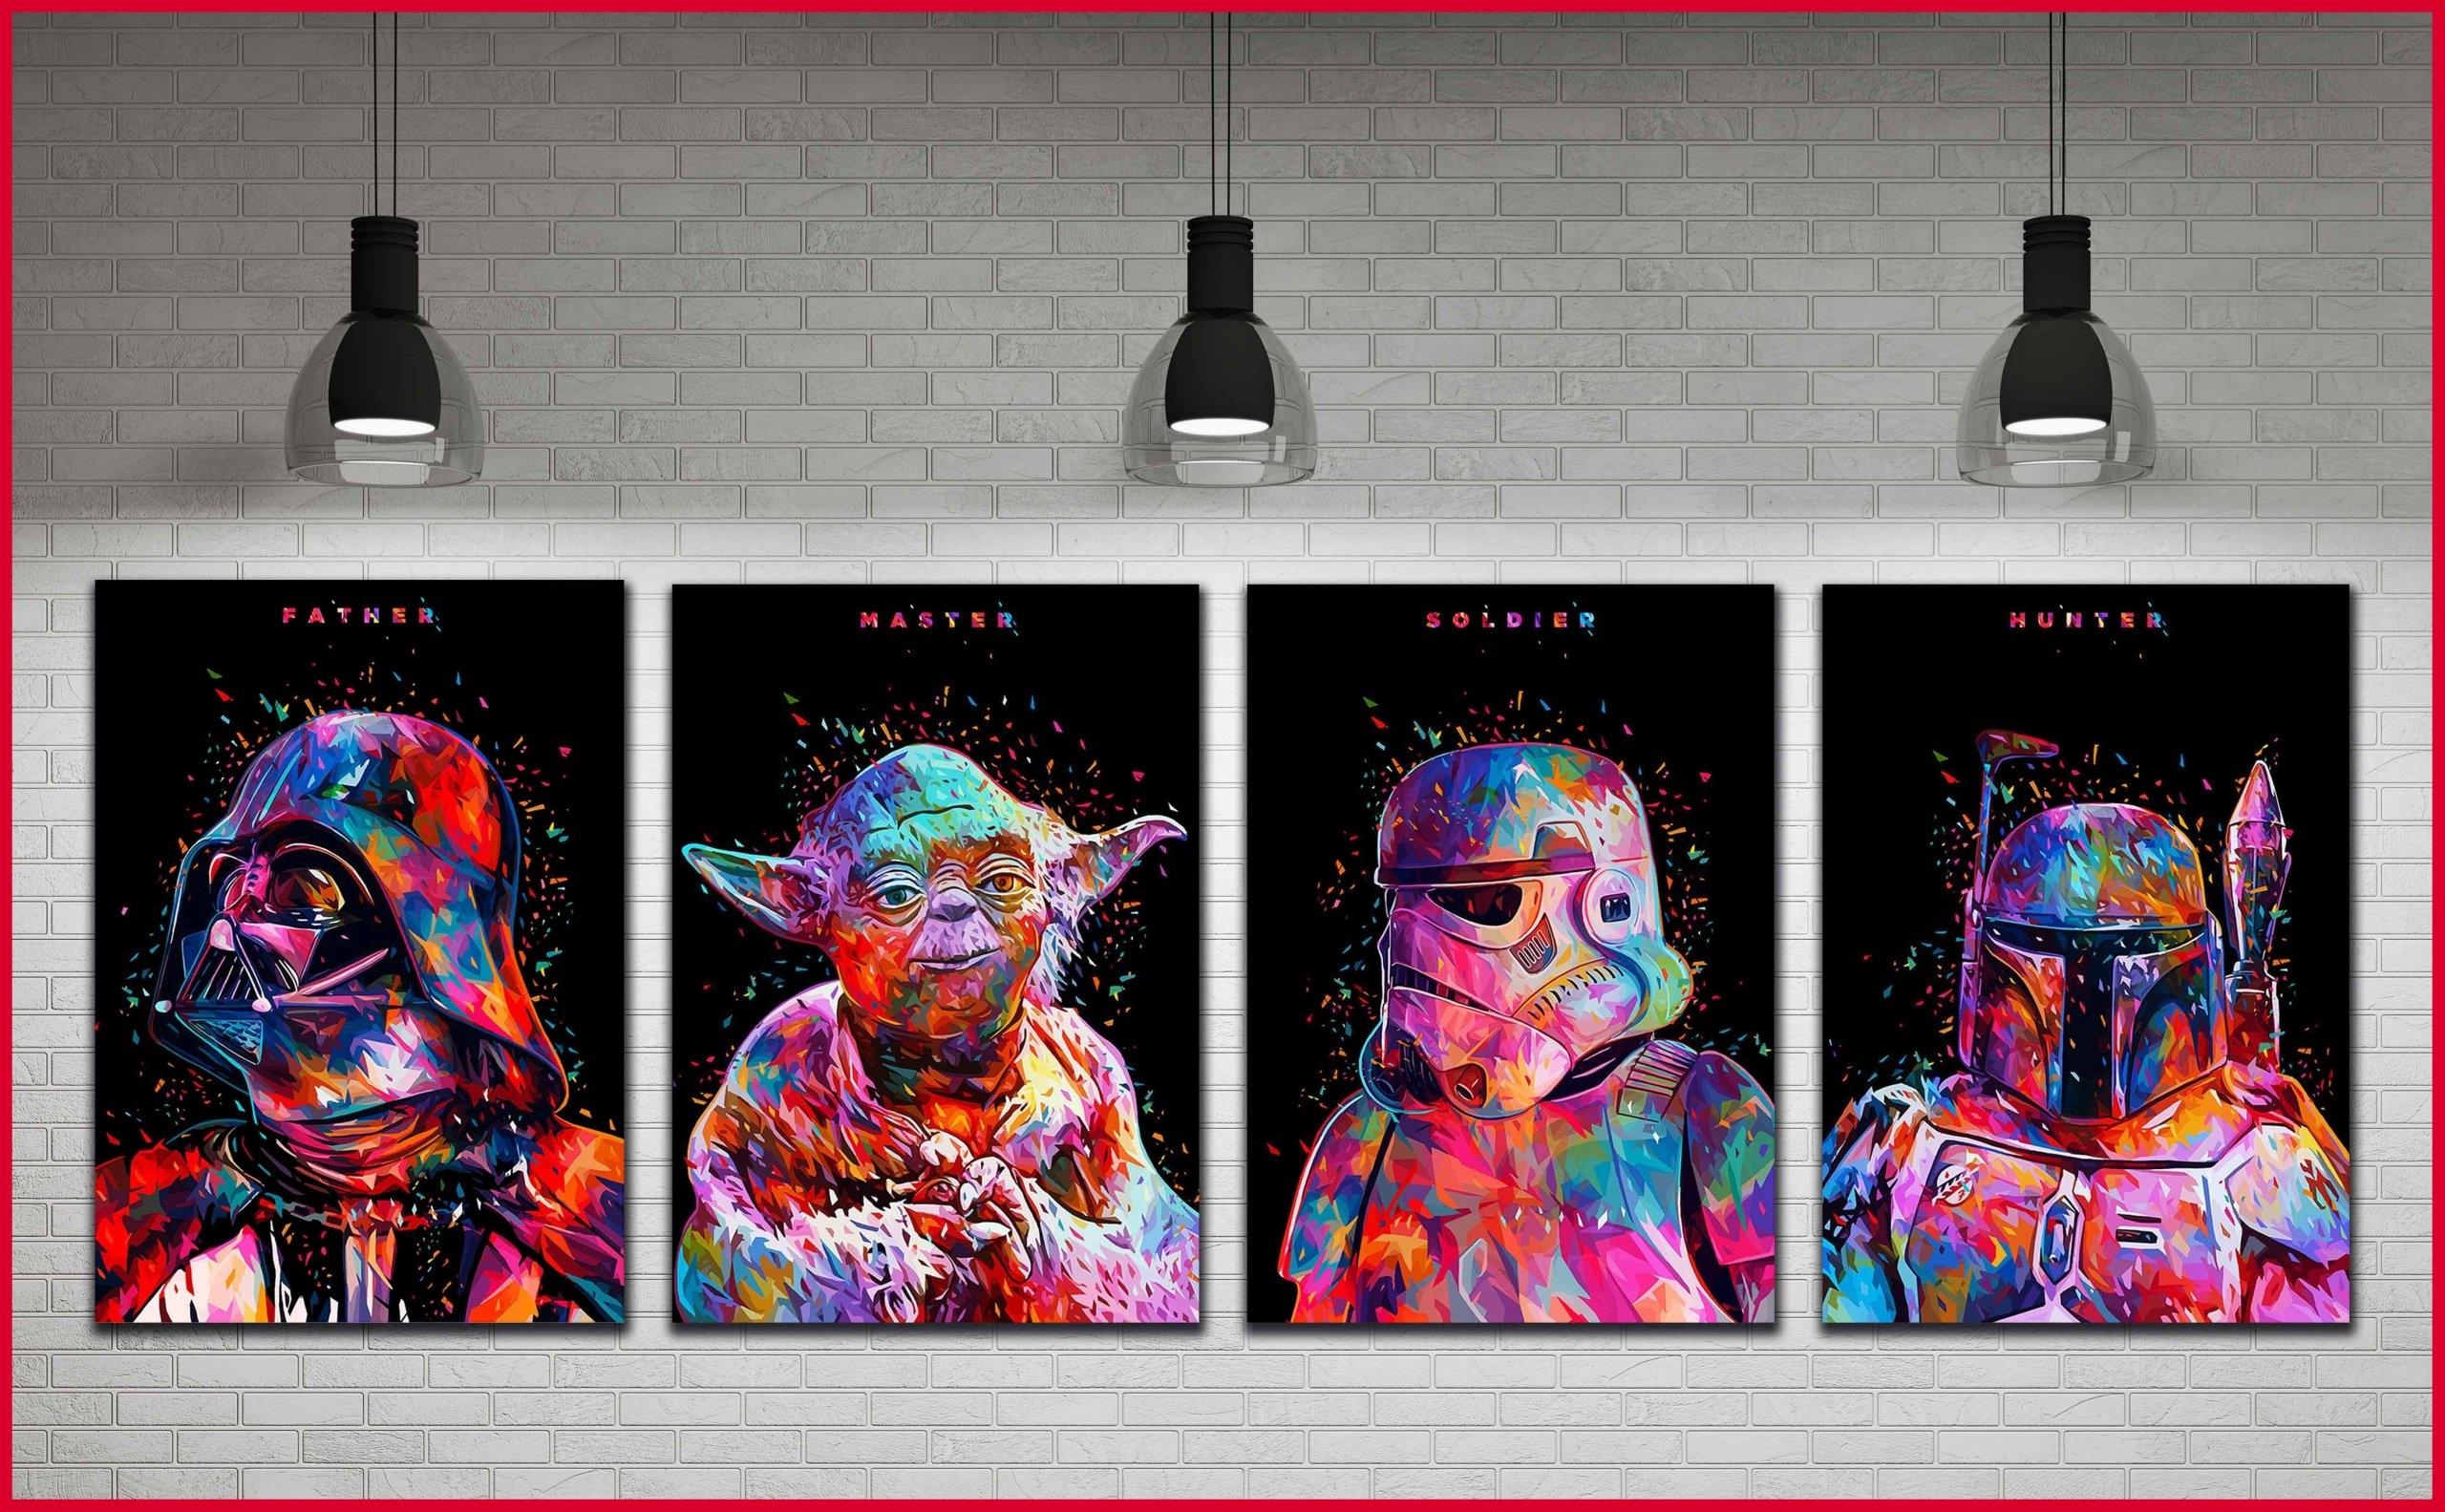 4x Obraz Star Wars Joda Vader Bobba Fett Last Jedi 7522607396